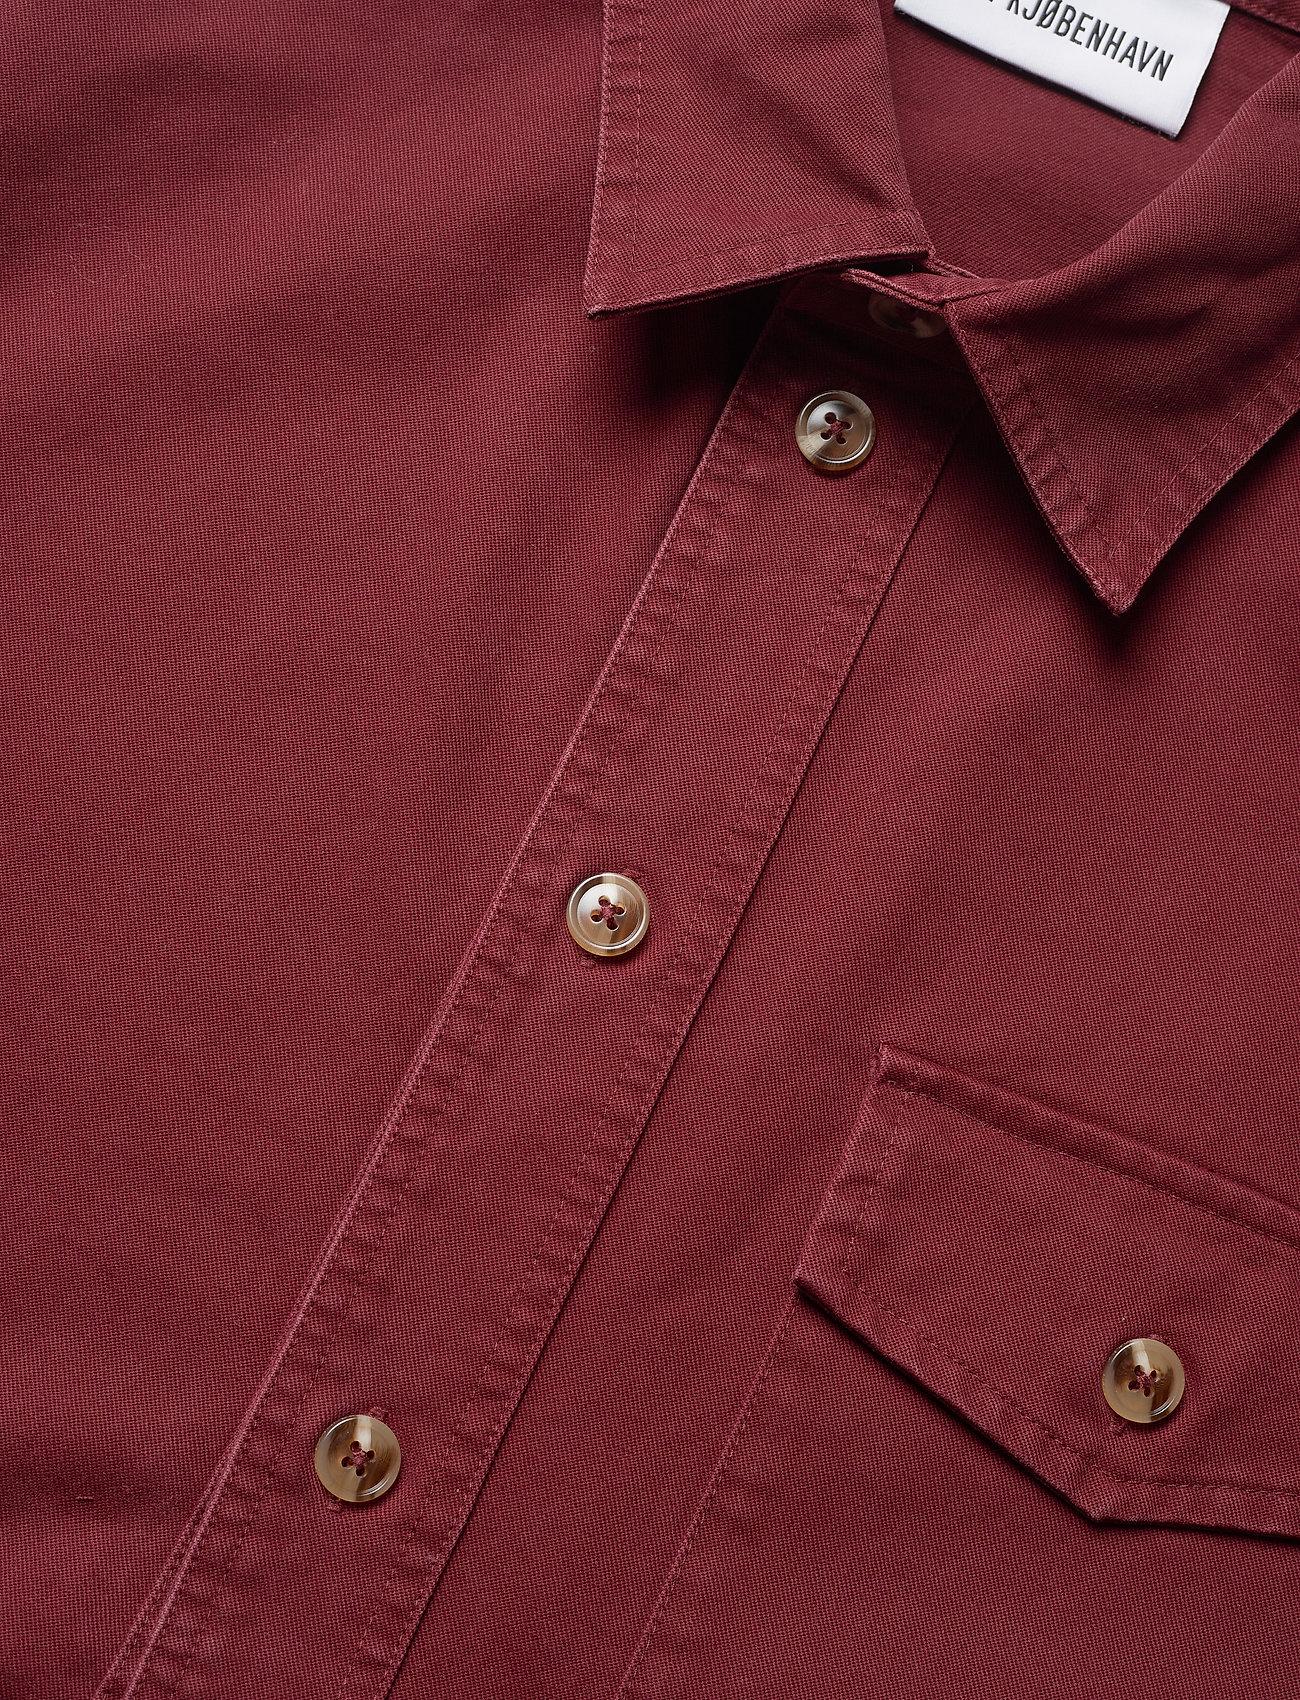 HAN Kjøbenhavn - Army Shirt - kleding - grey - 6